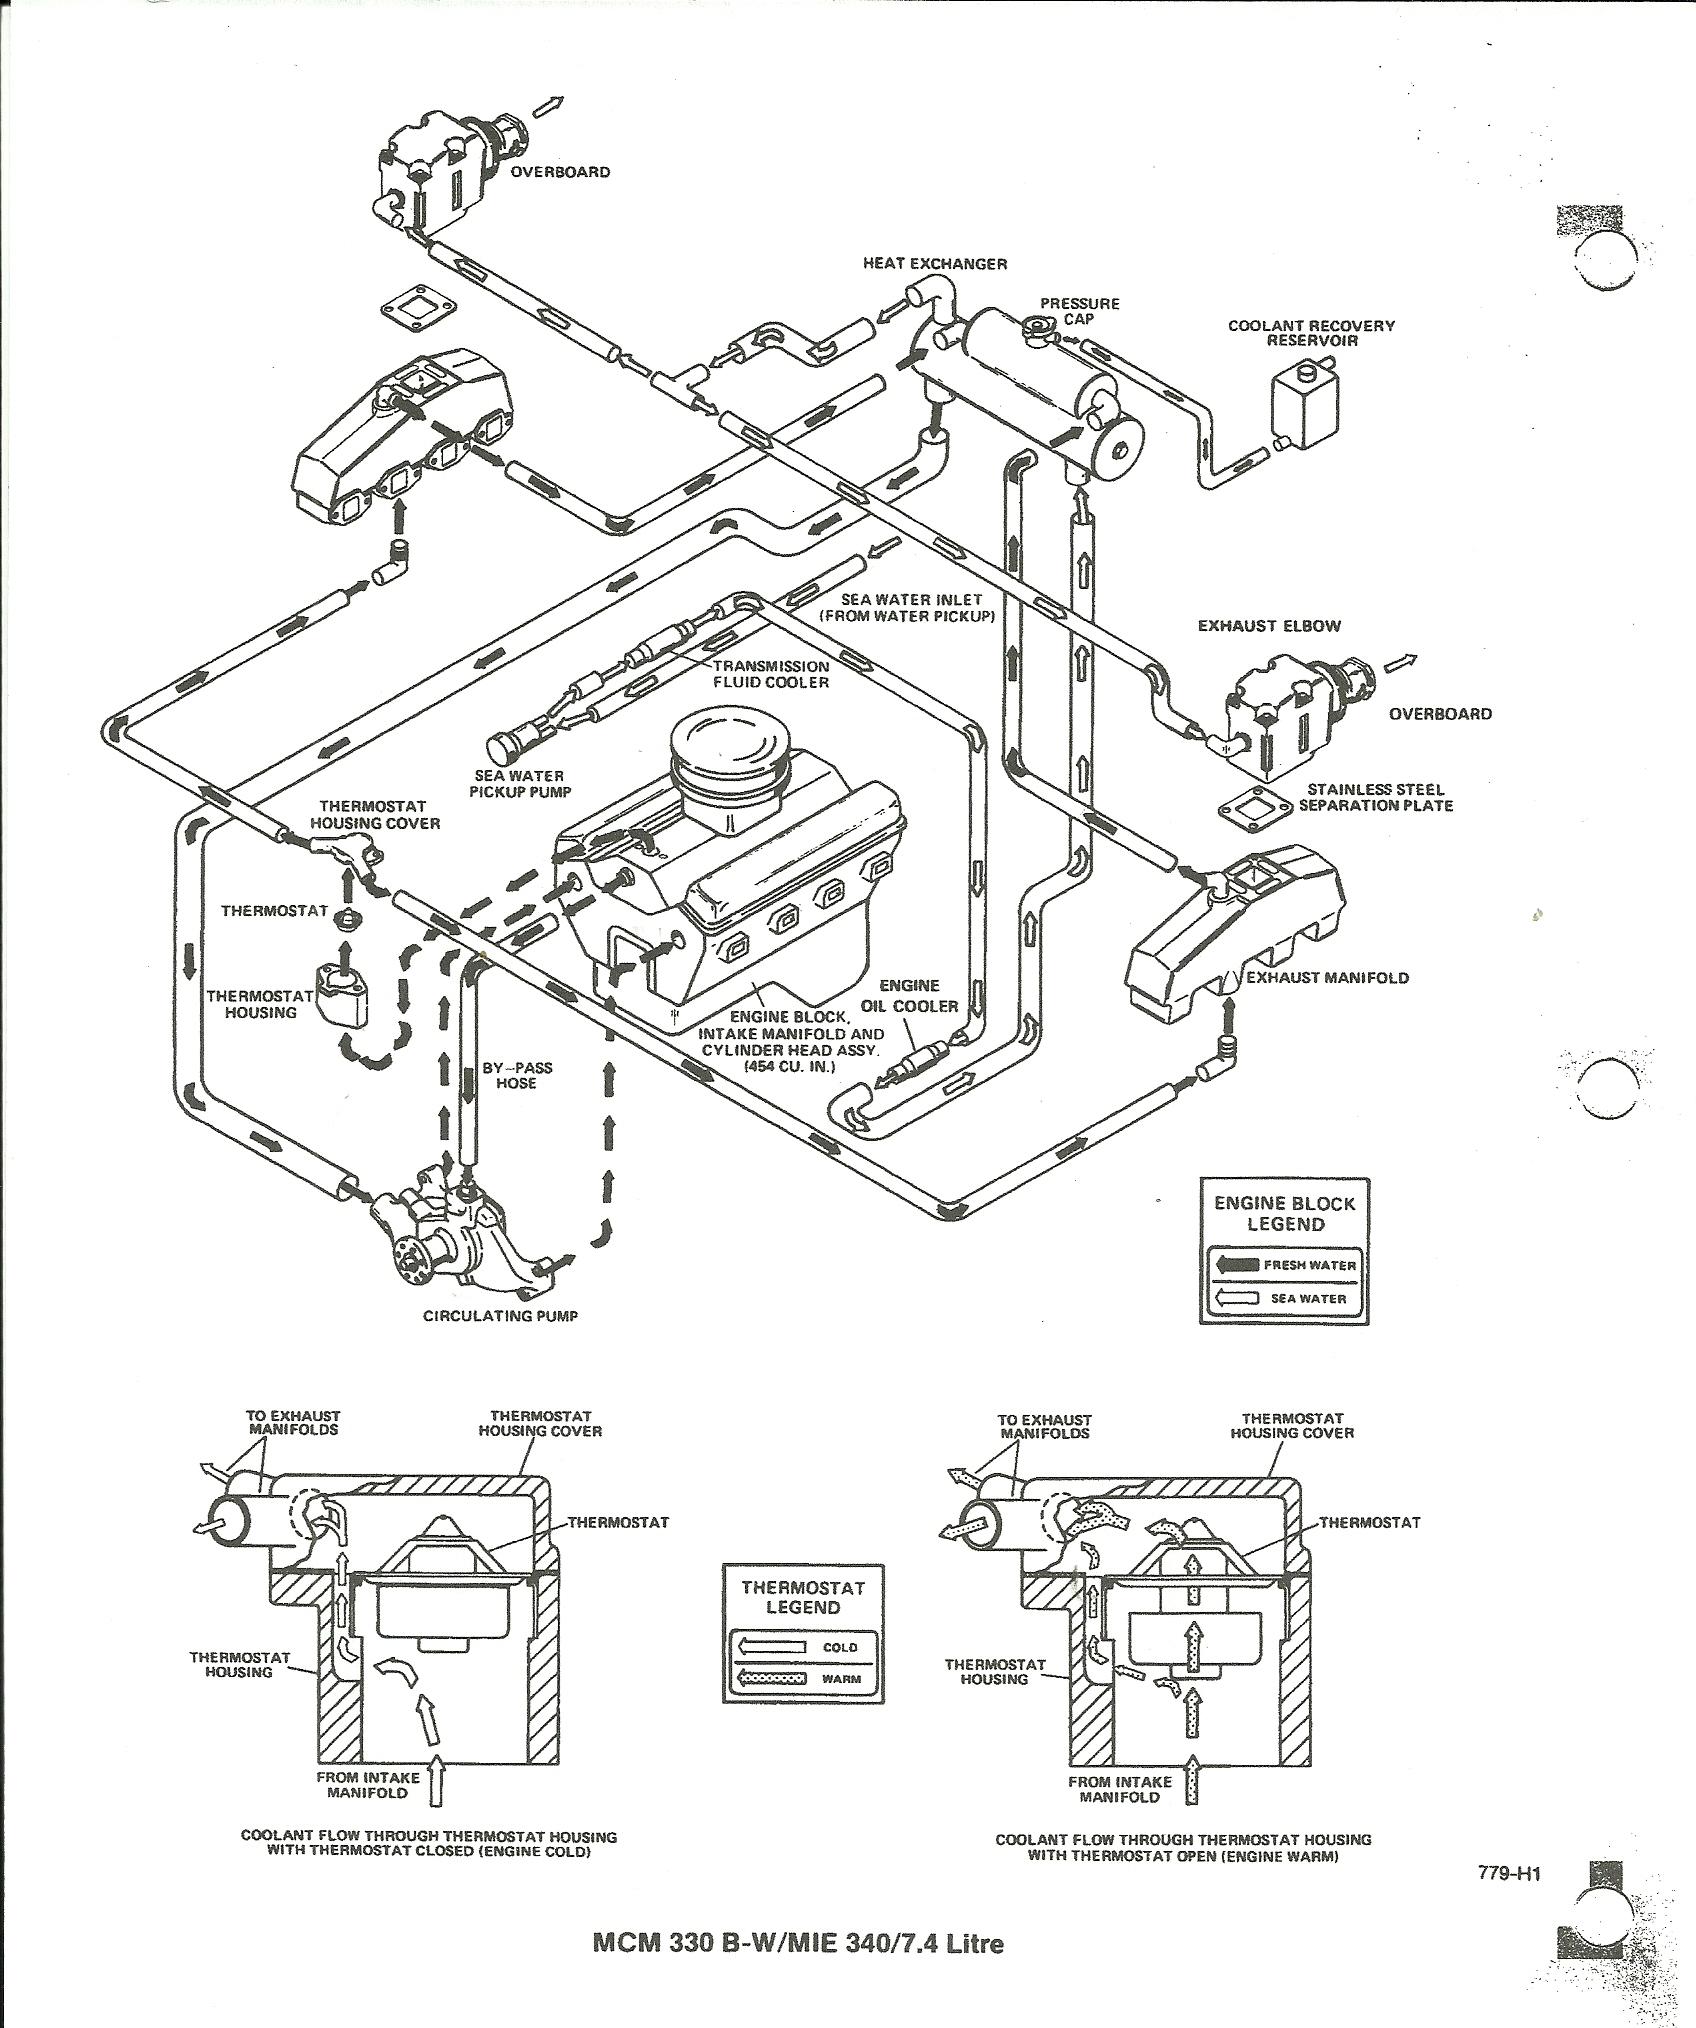 1988 volvo 240 exhaust diagram